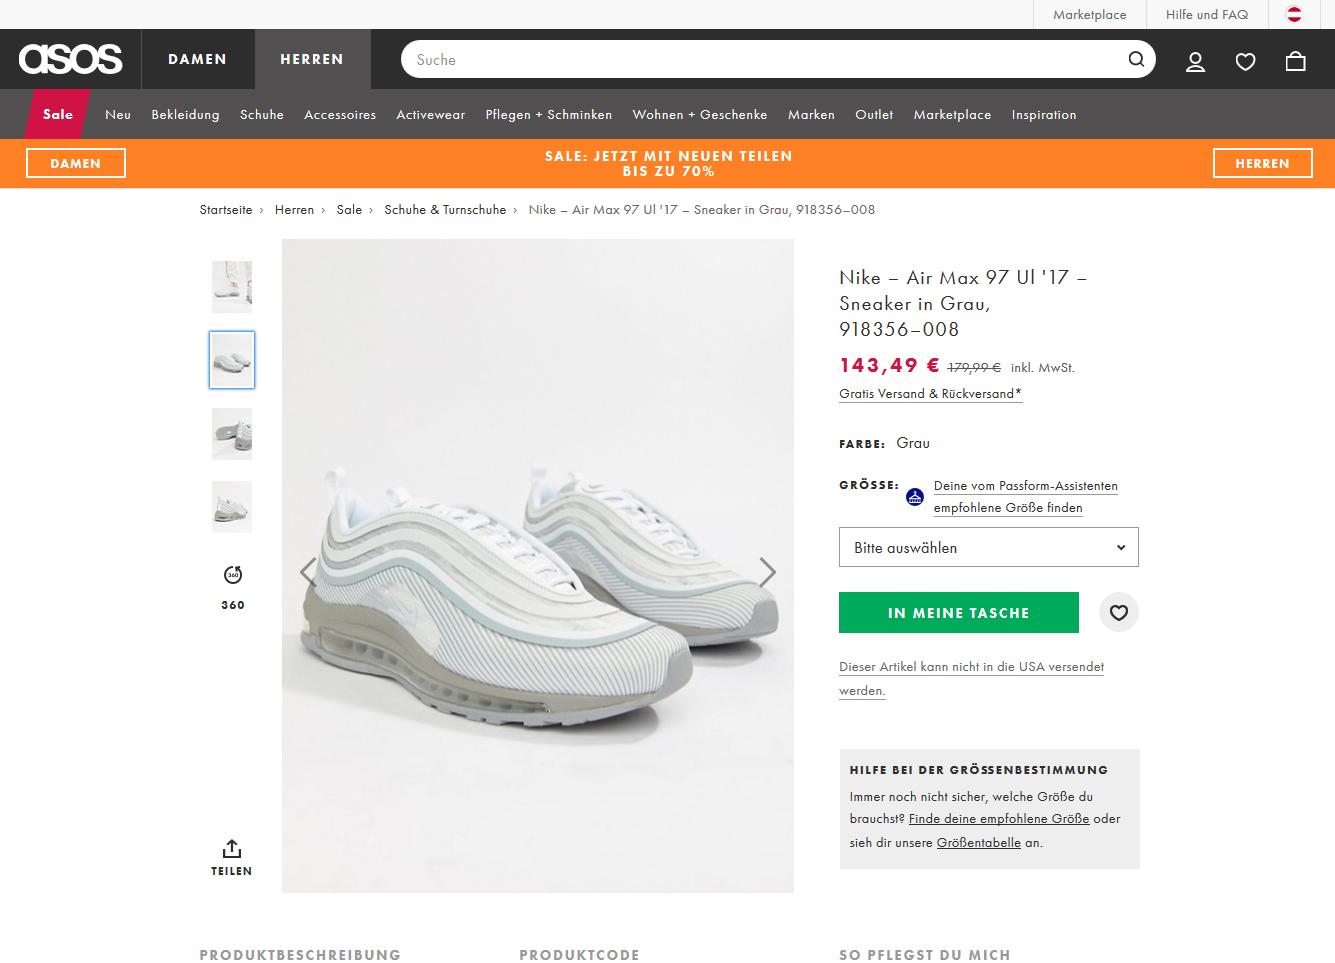 Nike – Air Max 97 Ul '17 – Sneaker in Grau für nur 143,49